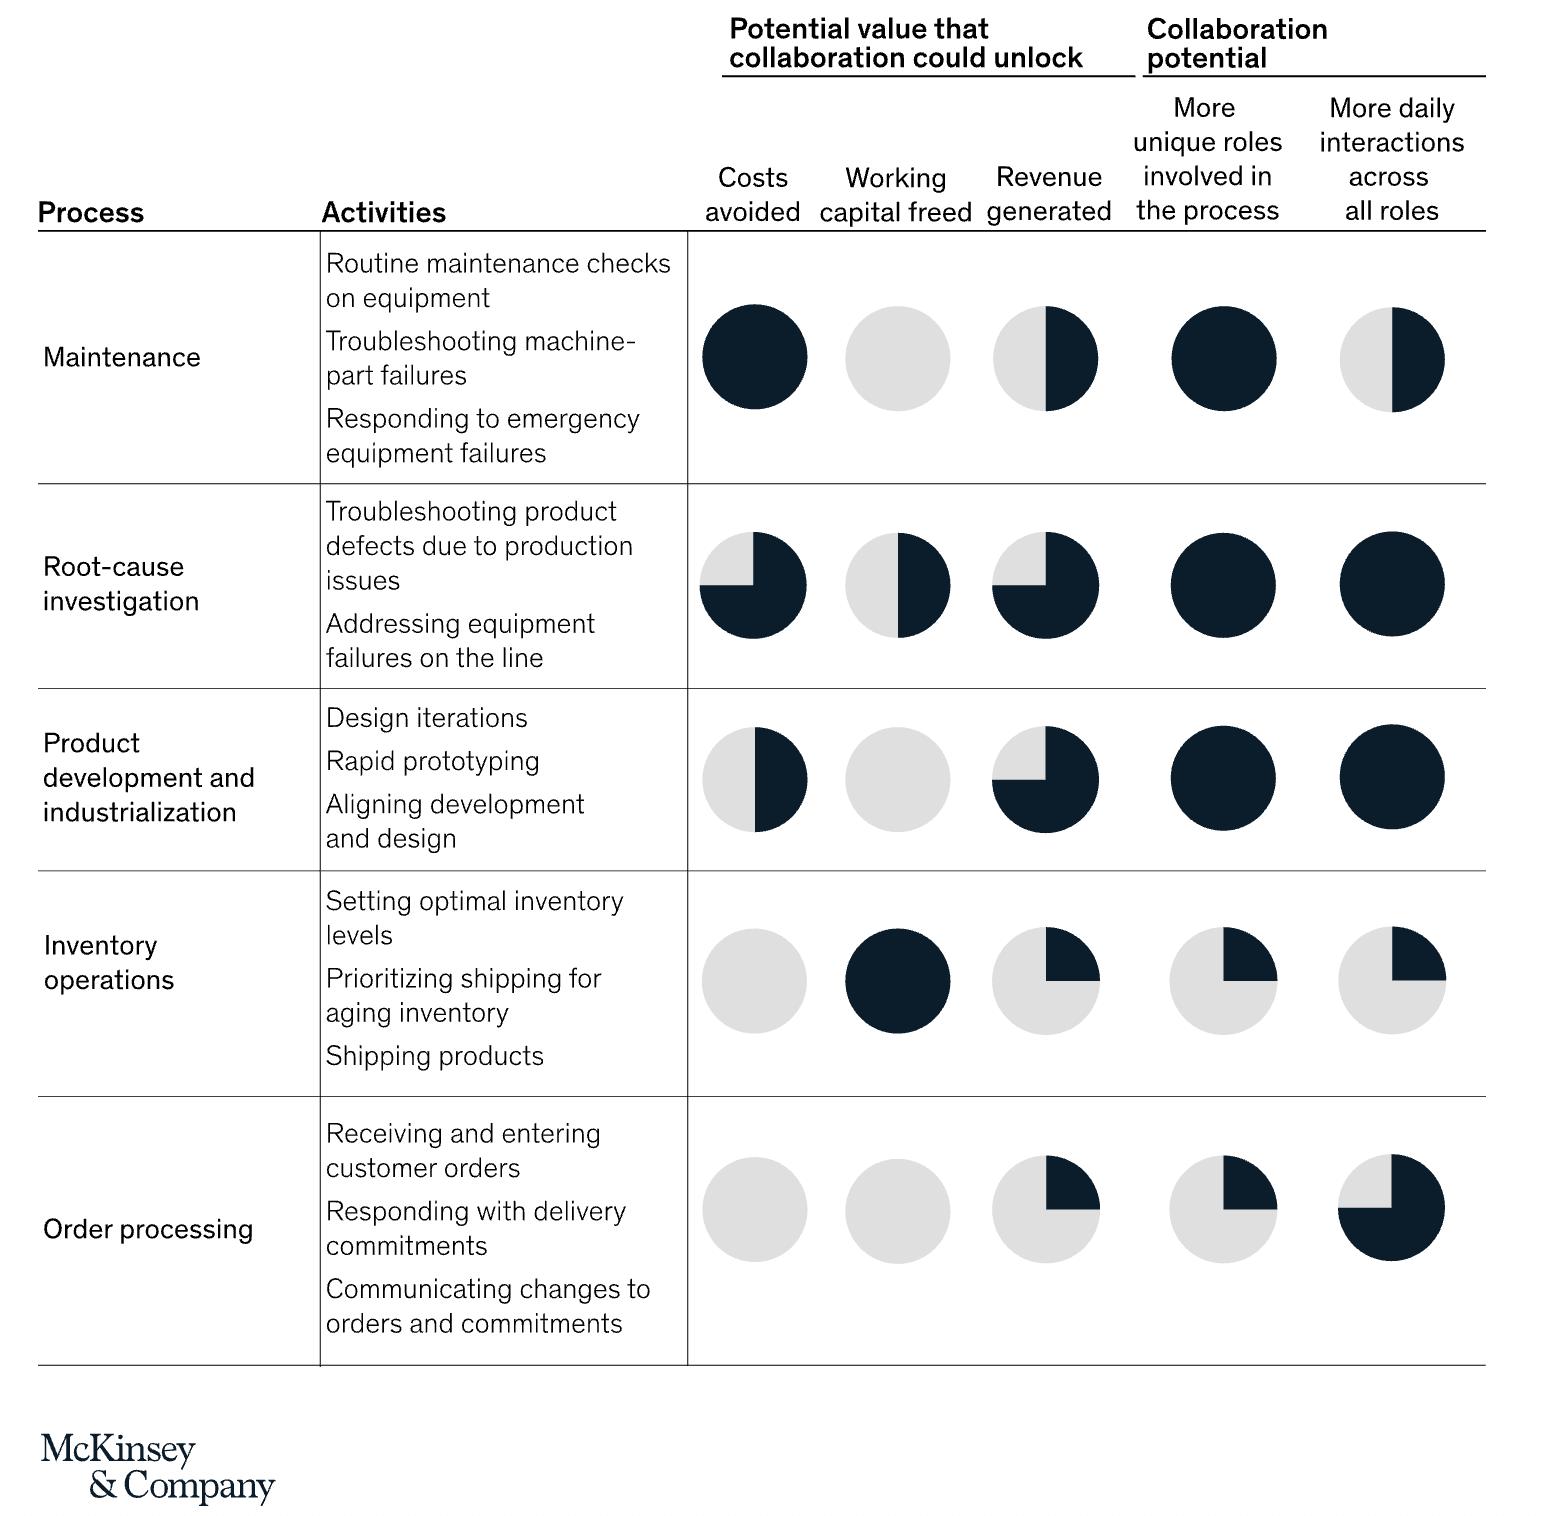 Integrating digital collaboration